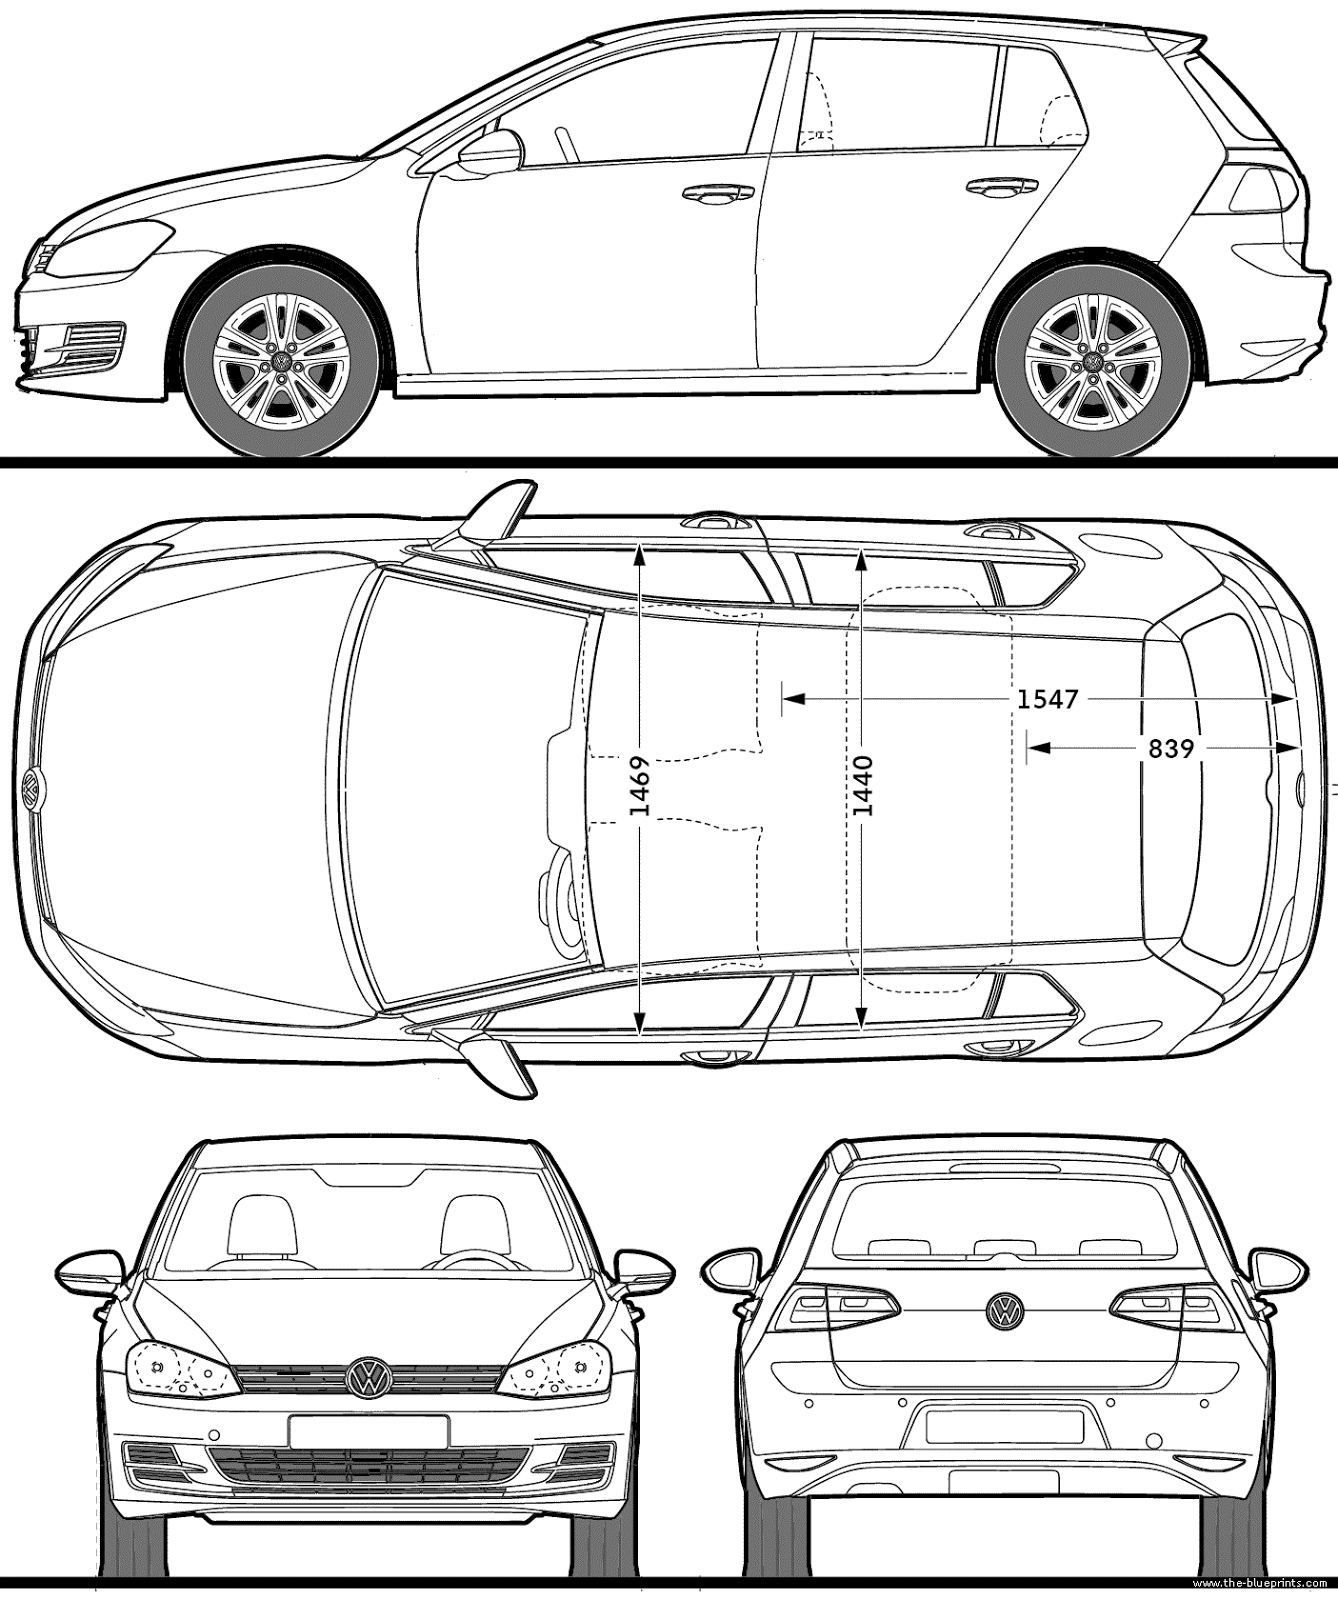 volkswagen golf 5 blueprints pinterest volkswagen golf volkswagen and cars. Black Bedroom Furniture Sets. Home Design Ideas